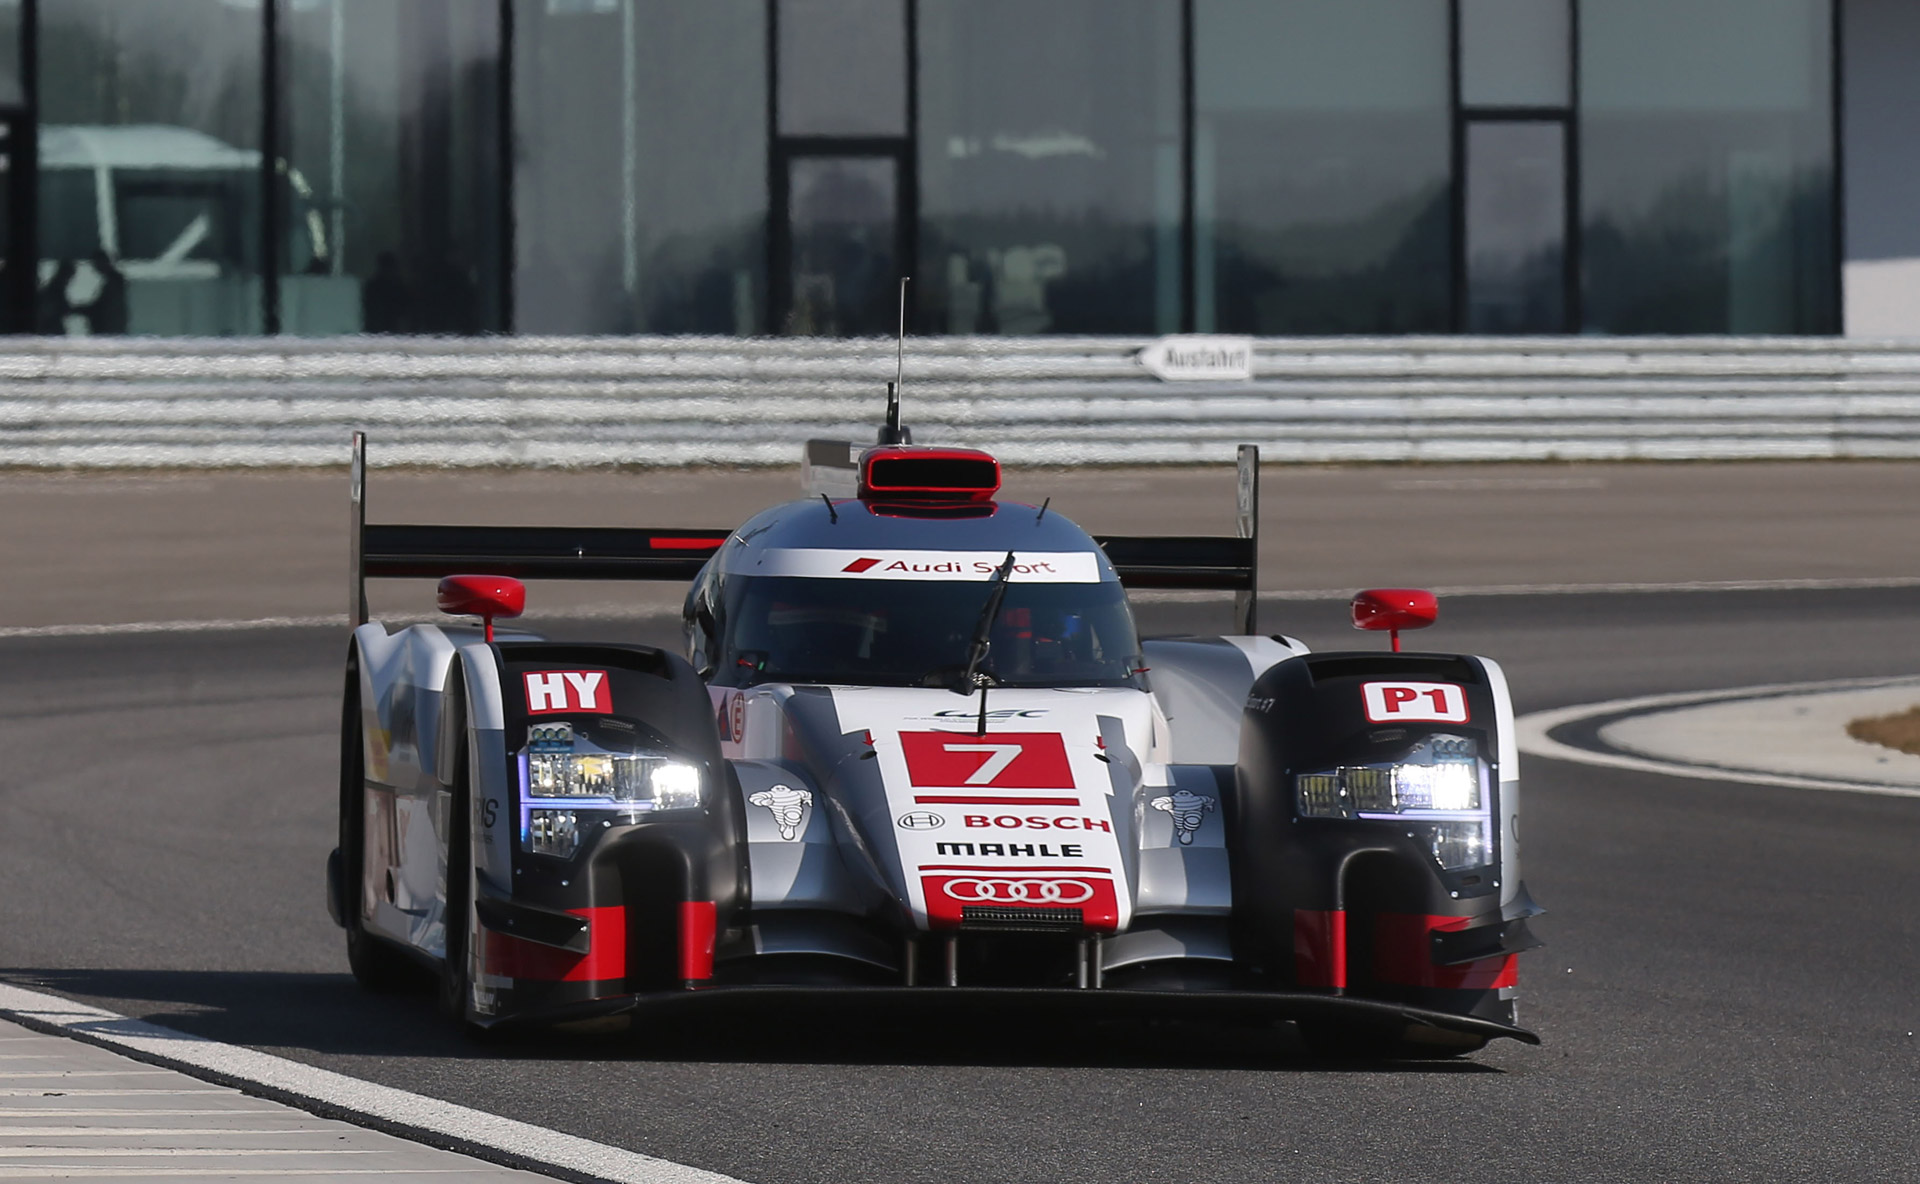 First Look At Audi R Etron Quattro Le Mans Prototype - Audi r18 e tron quattro